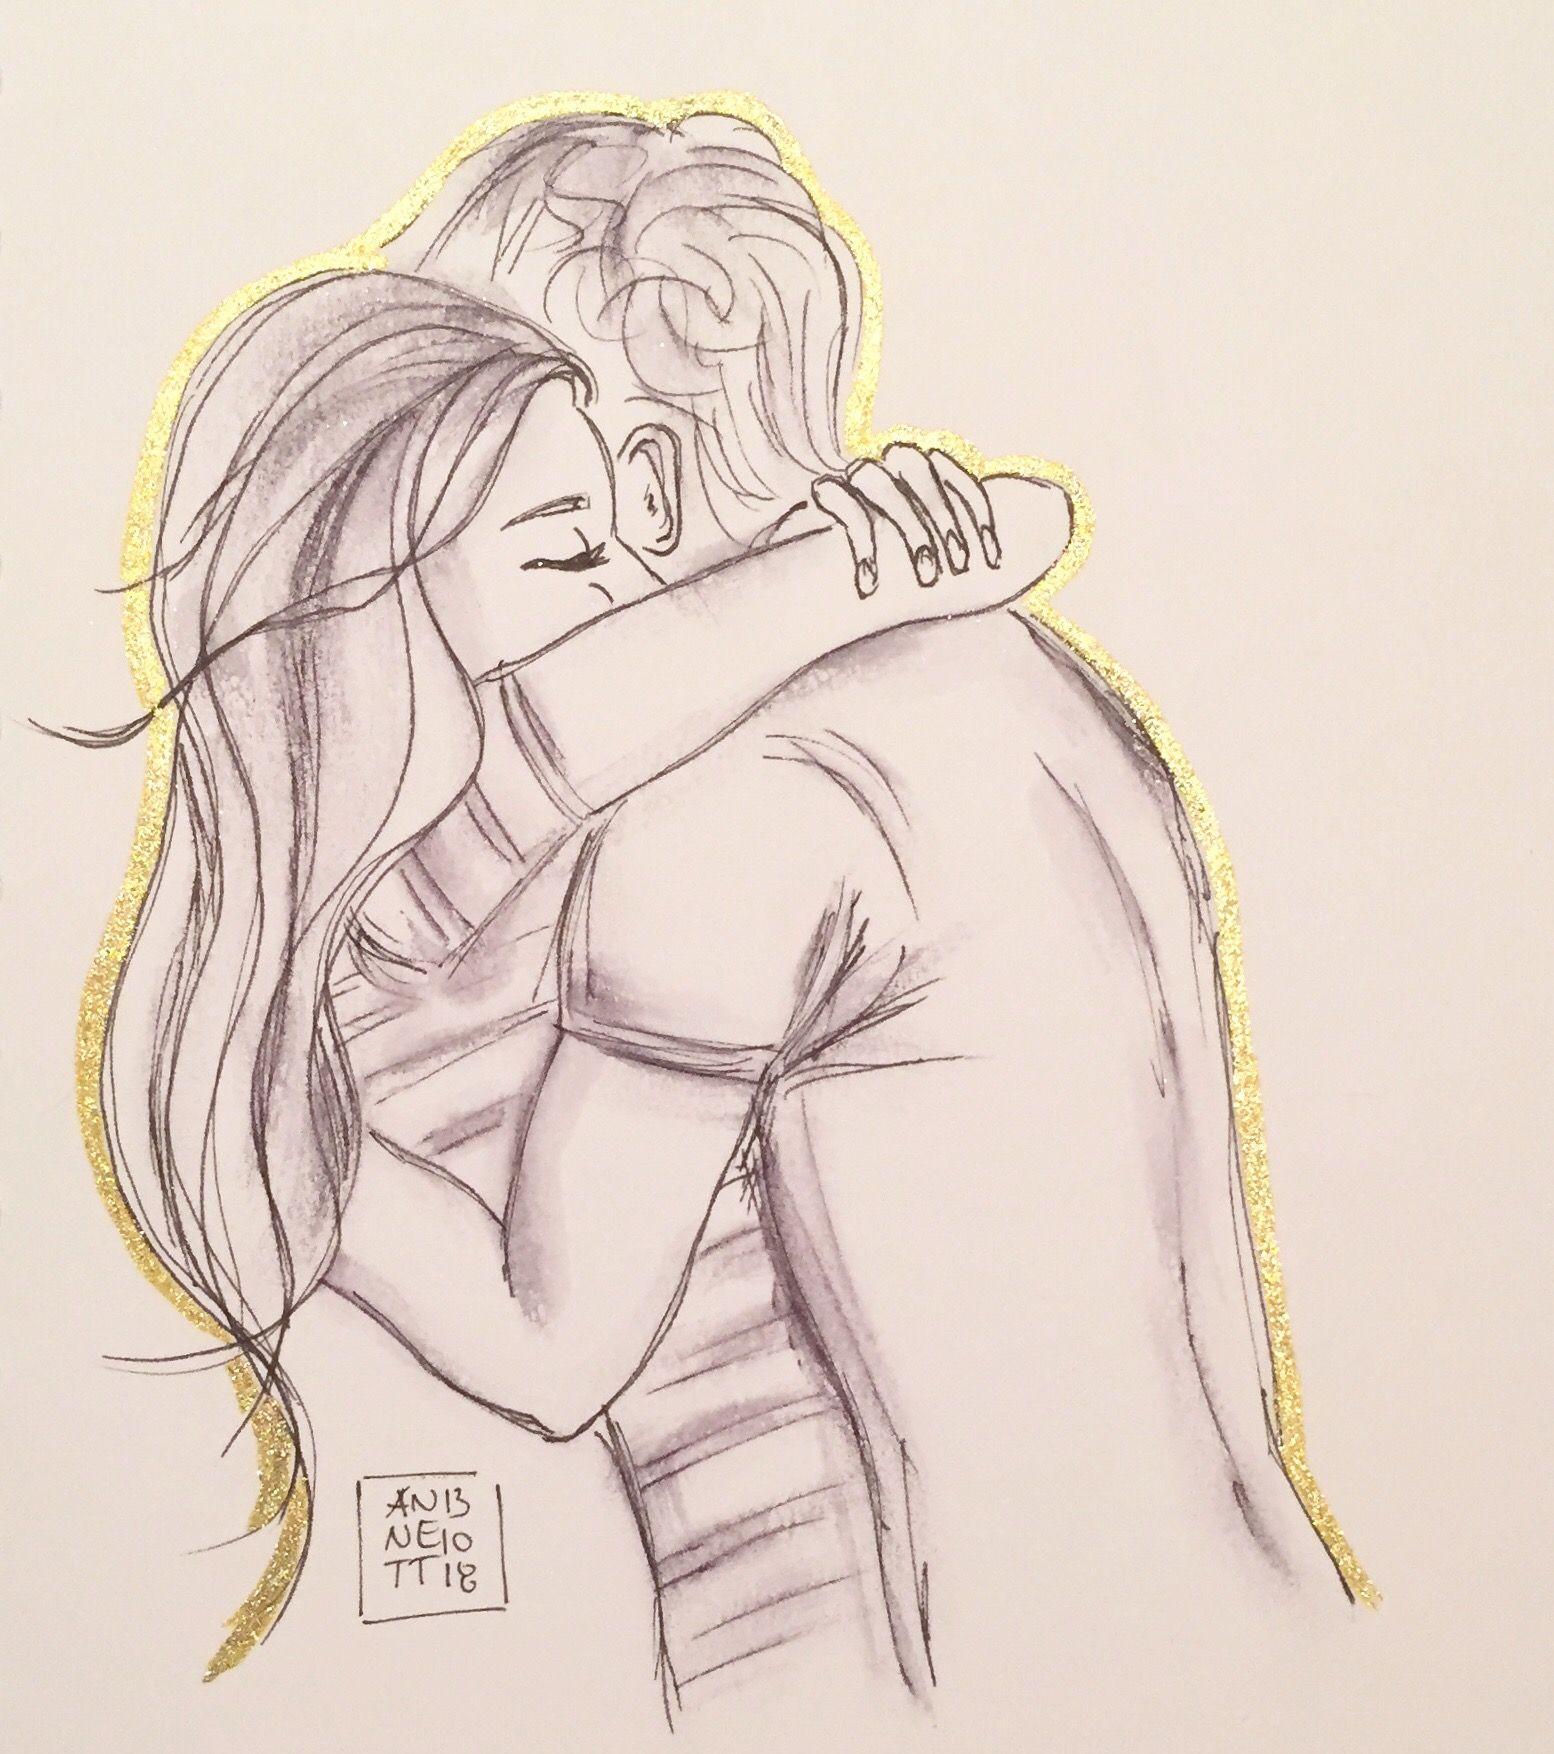 I miss our hug